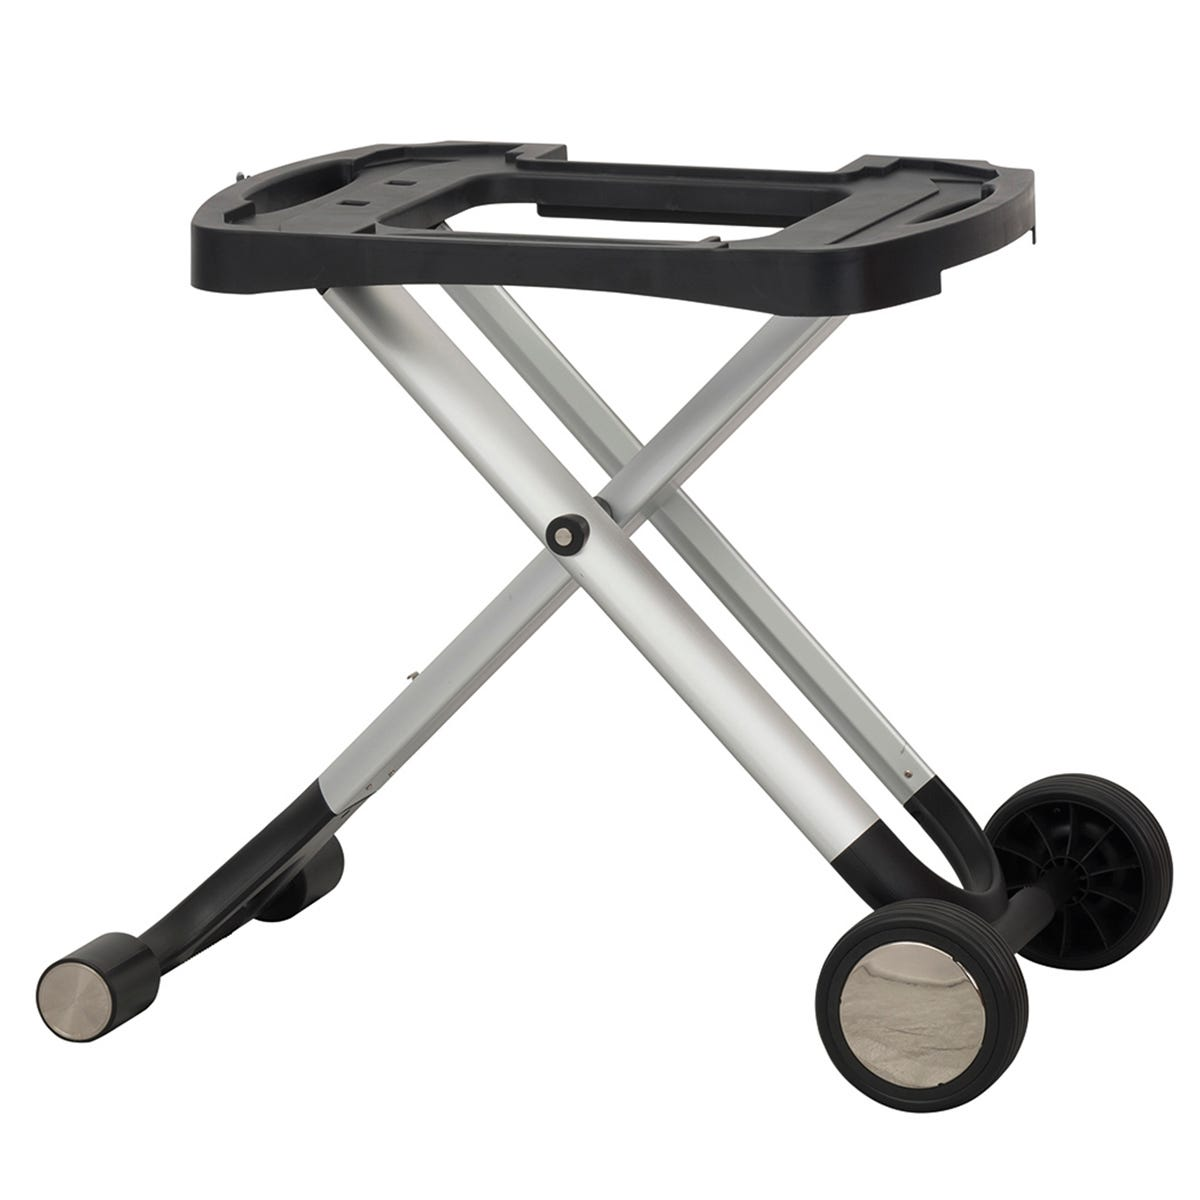 Universal Foldable Trolley for TEK Portable Gas BBQ